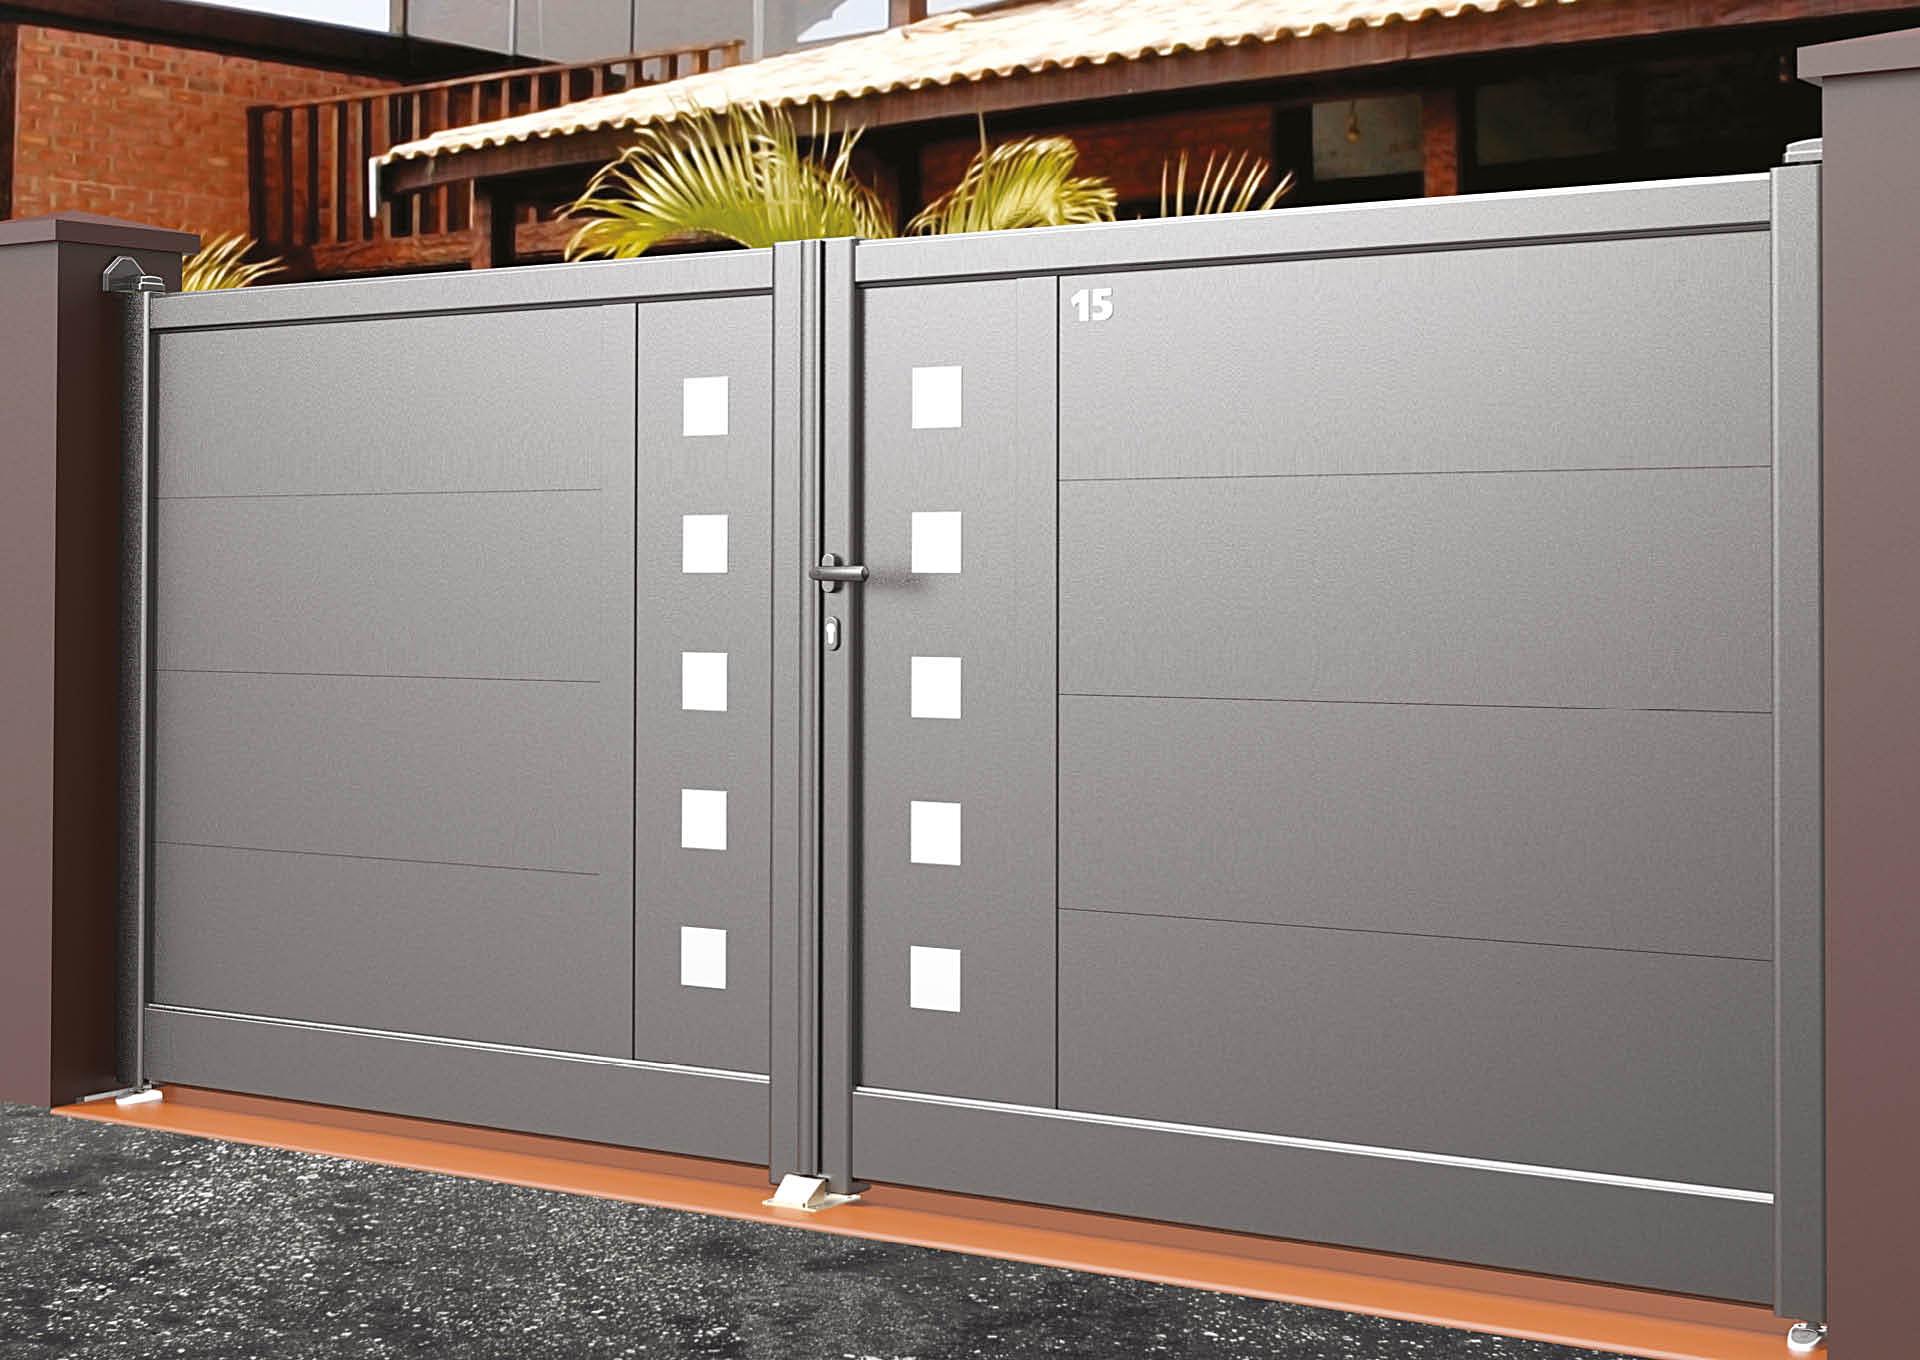 Portail battant en aluminium 9110_B_P3DA Lames horizontales 340mm + décor alu Carrés pleins